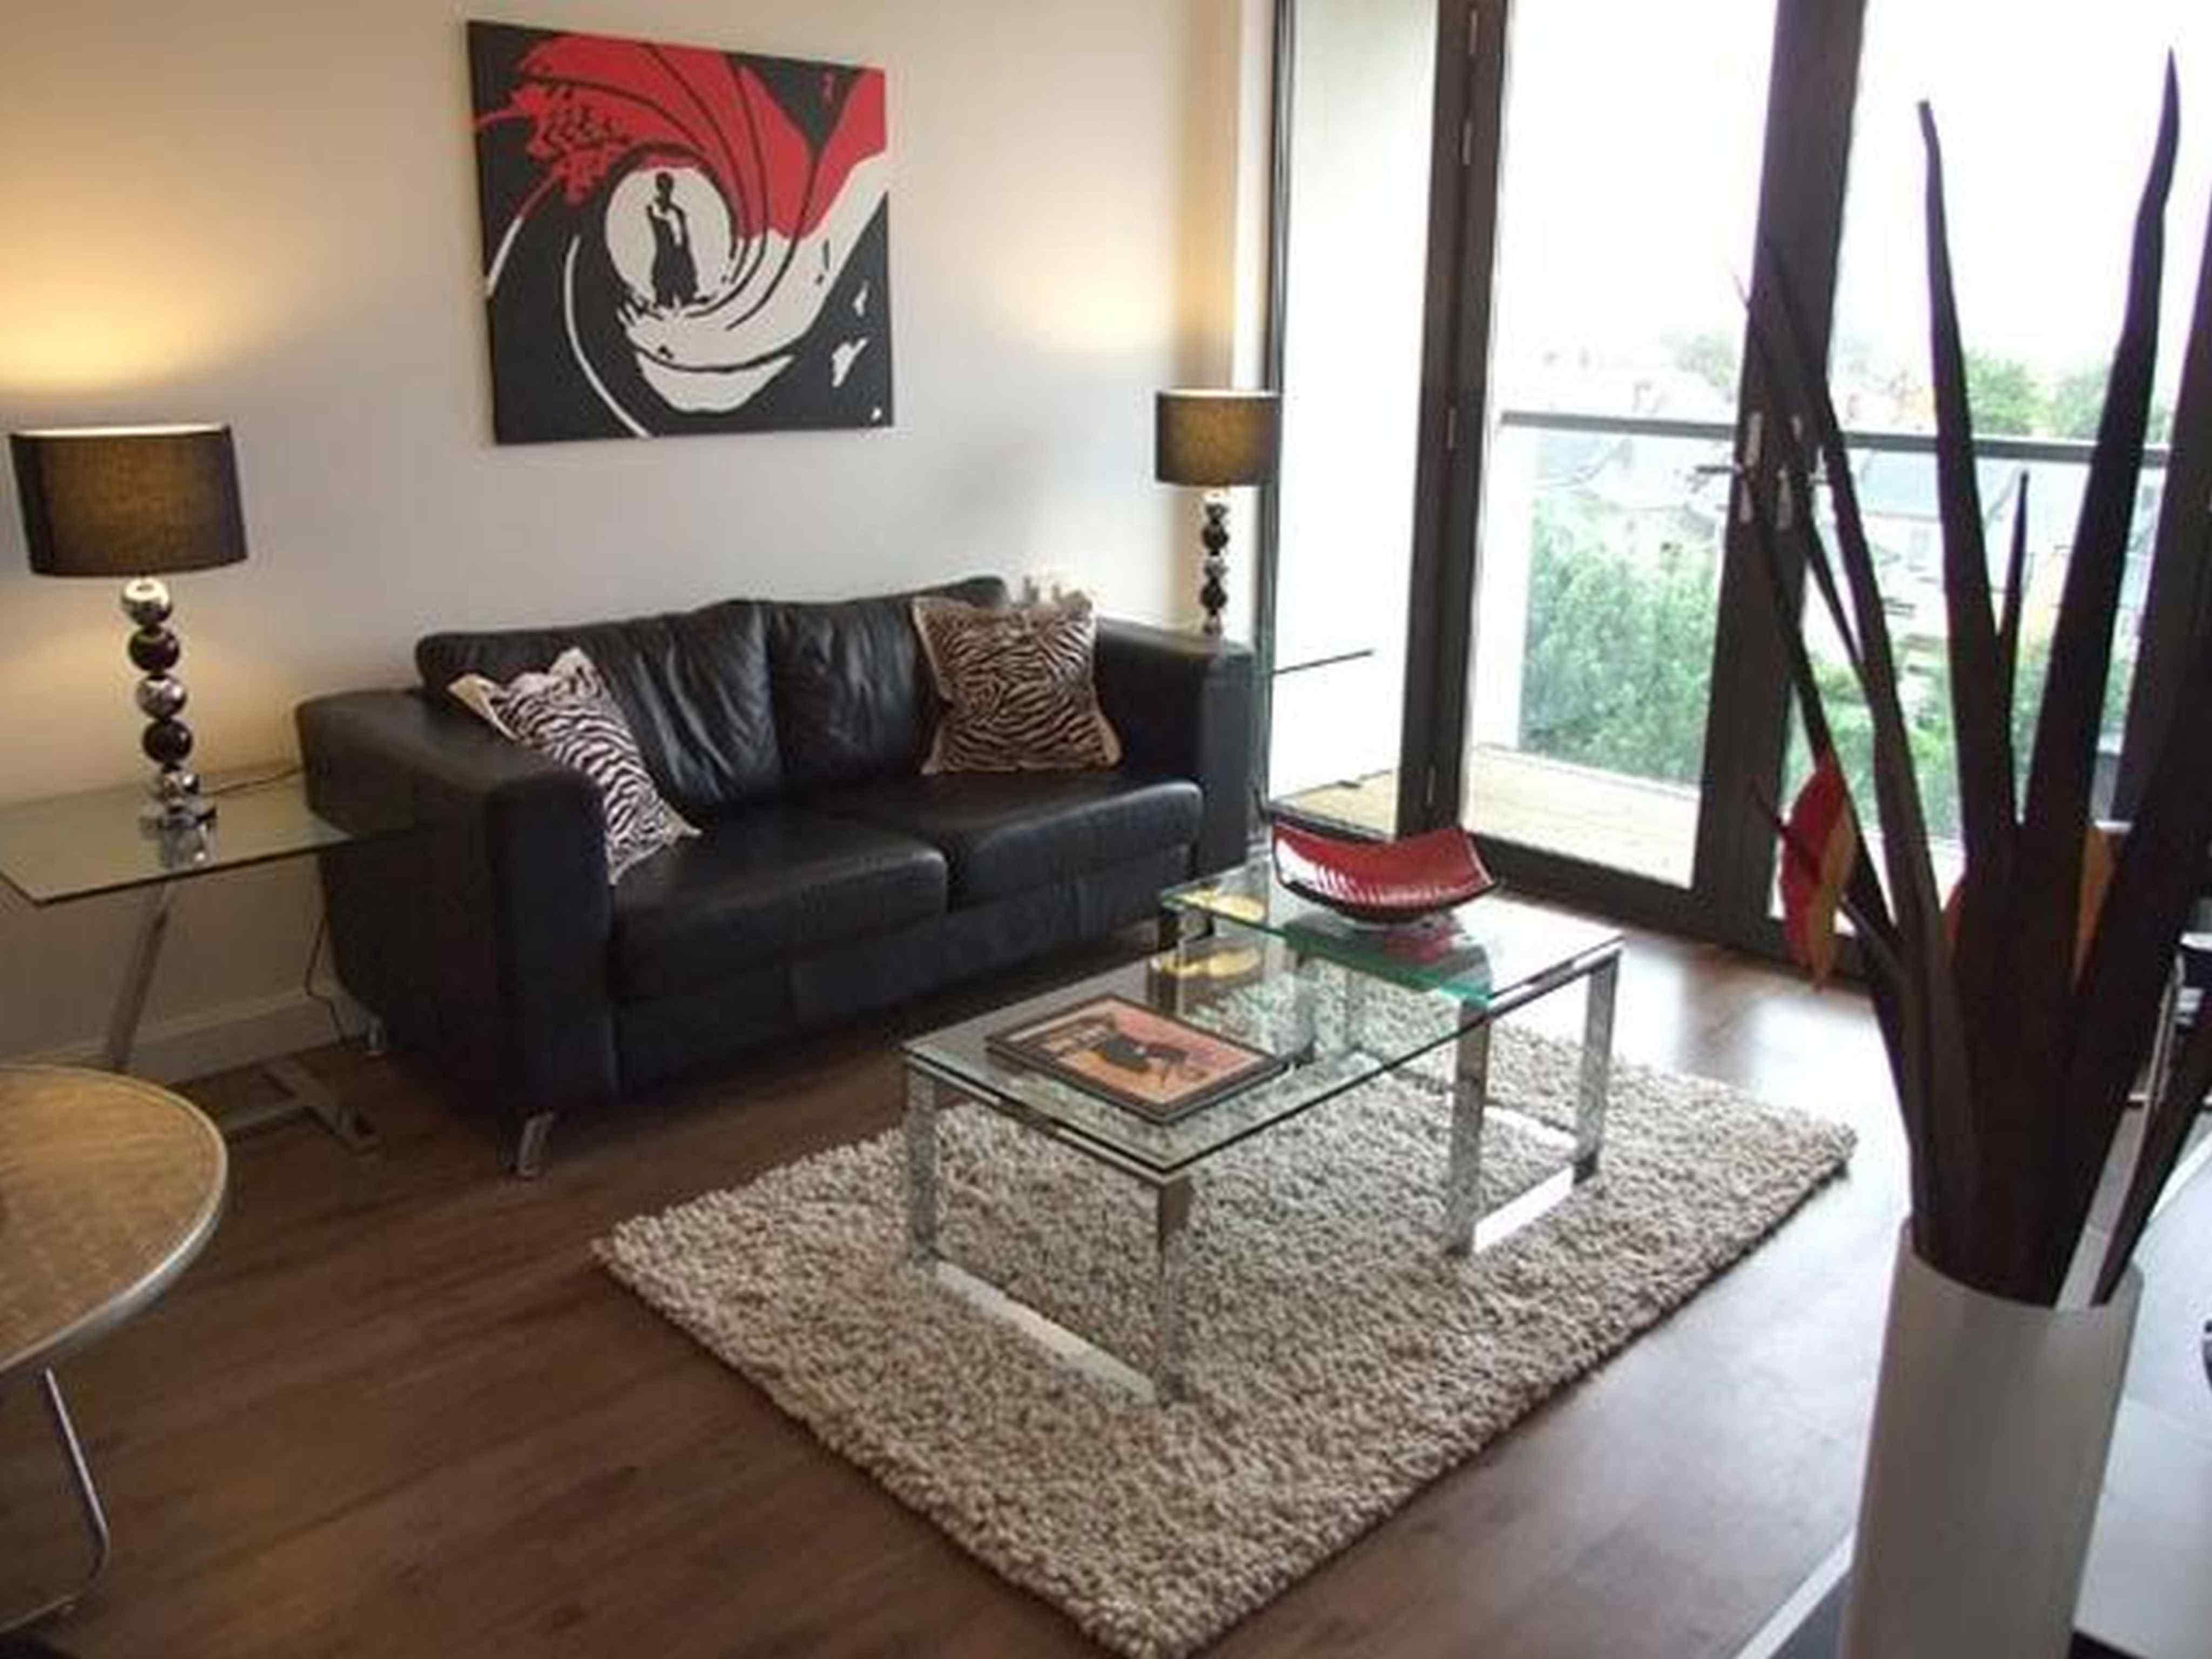 35+ Amazing Fresh Home Decor Ideas Living Room On A Budget ...